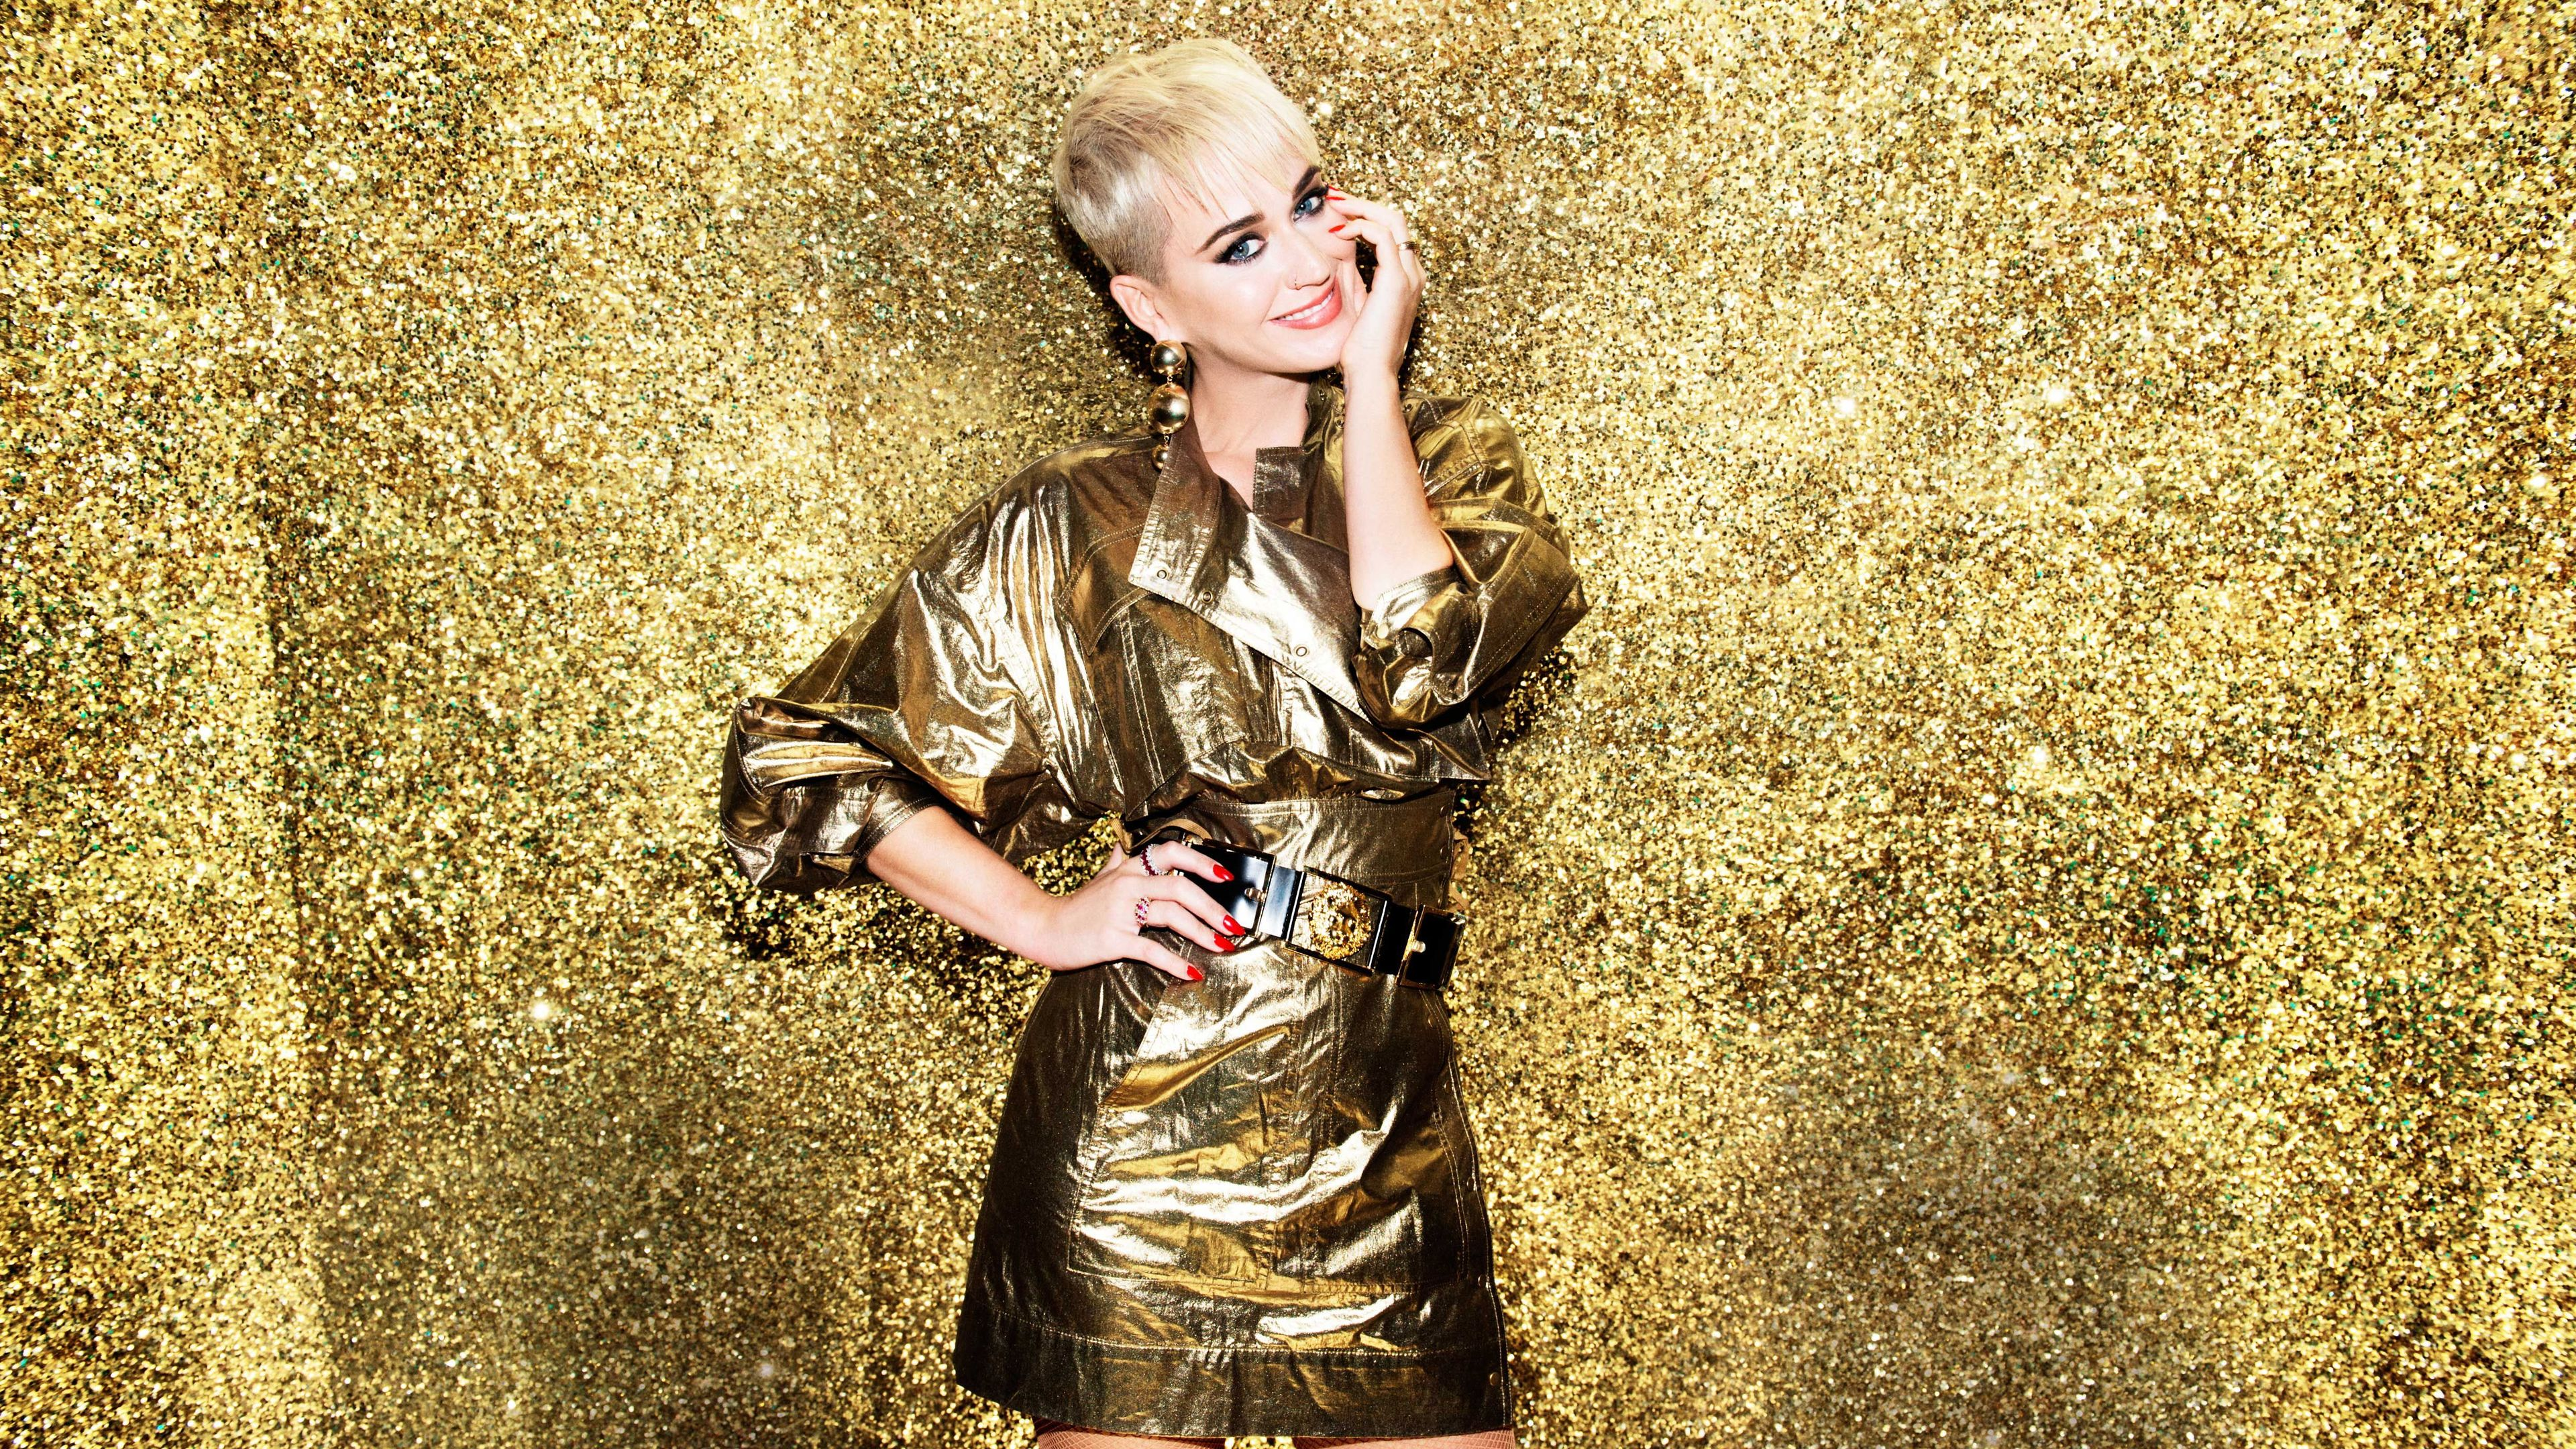 katy perry sparkle dress 5k 1536946055 - Katy Perry Sparkle Dress 5k - music wallpapers, katy perry wallpapers, hd-wallpapers, girls wallpapers, celebrities wallpapers, 5k wallpapers, 4k-wallpapers